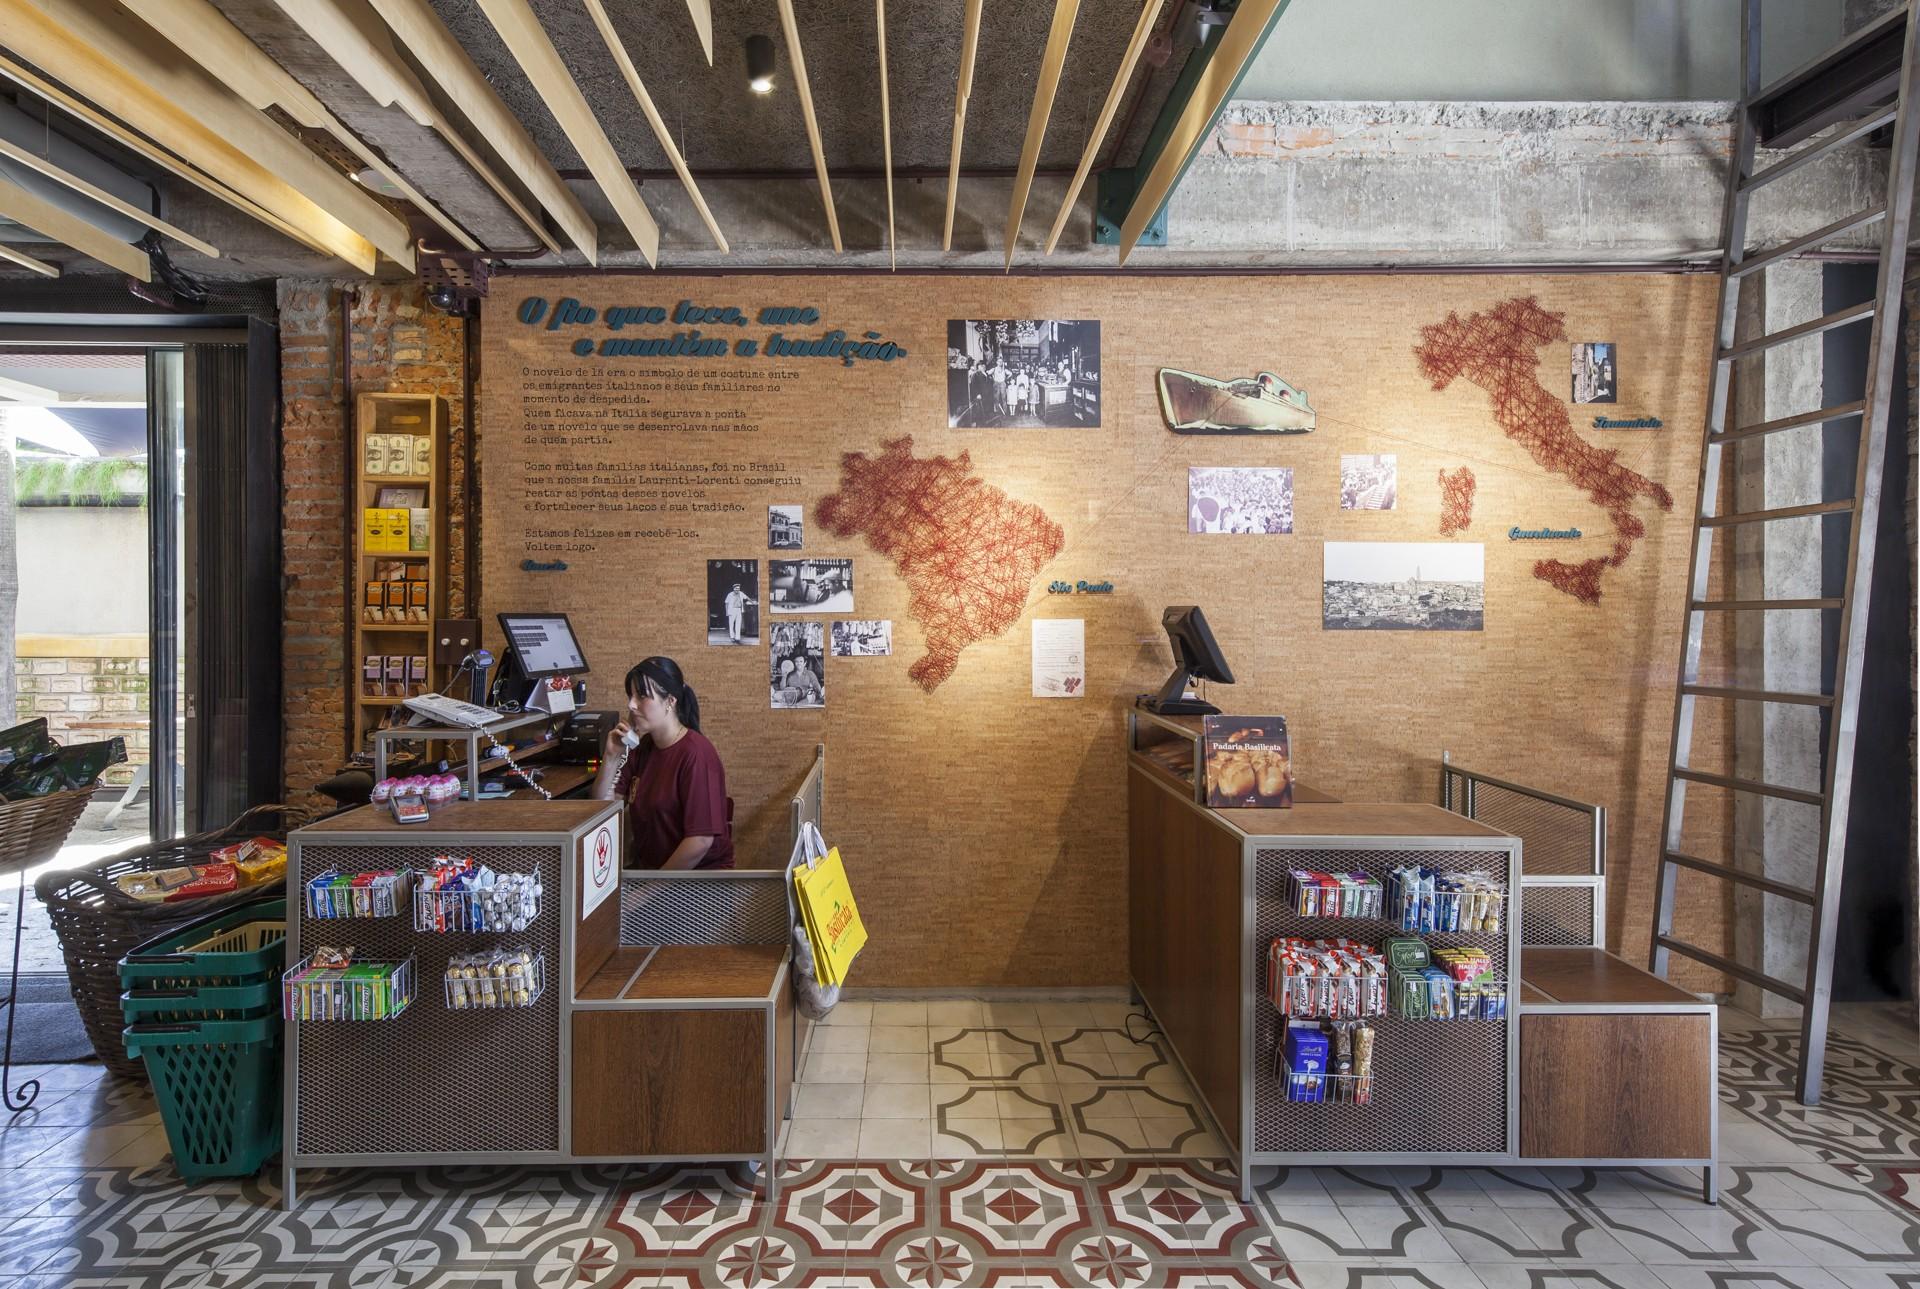 SuperLimão Studio Basilicata – Bakery, Emporium and Restaurant in San Paolo